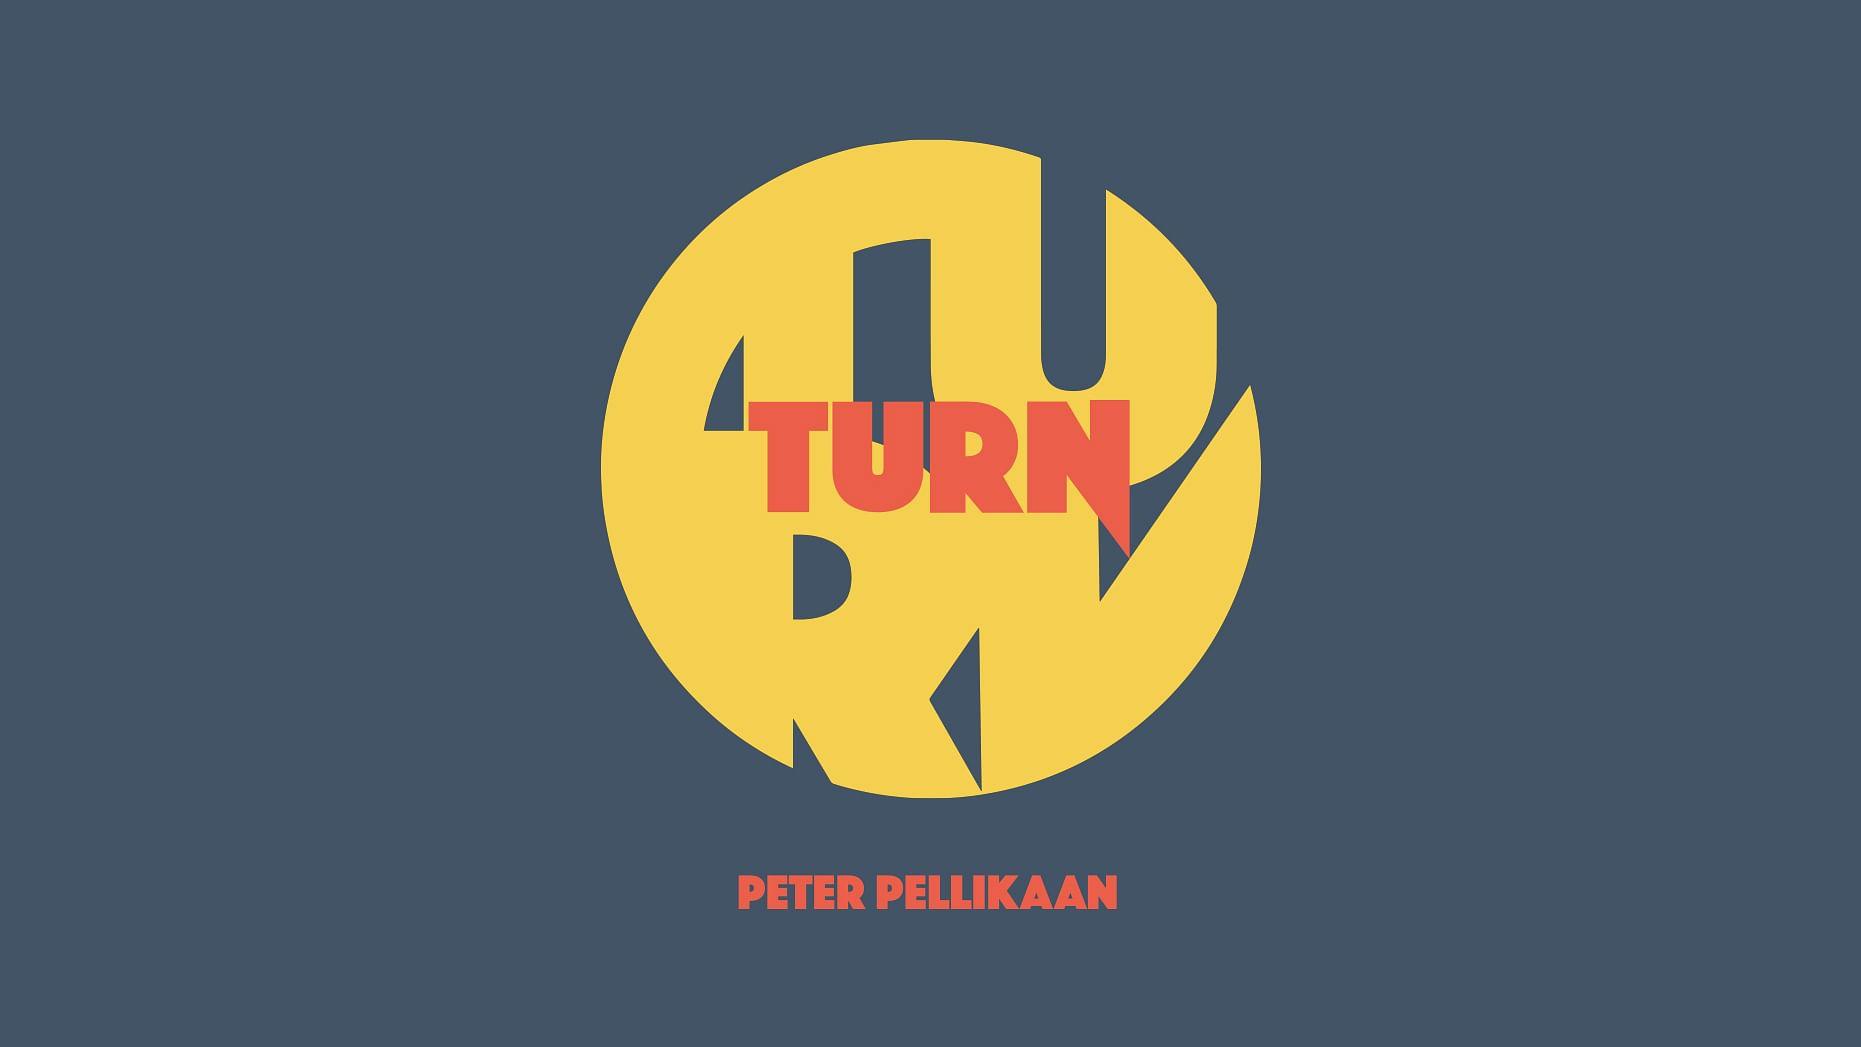 Turn by Peter Pellikaan - magic